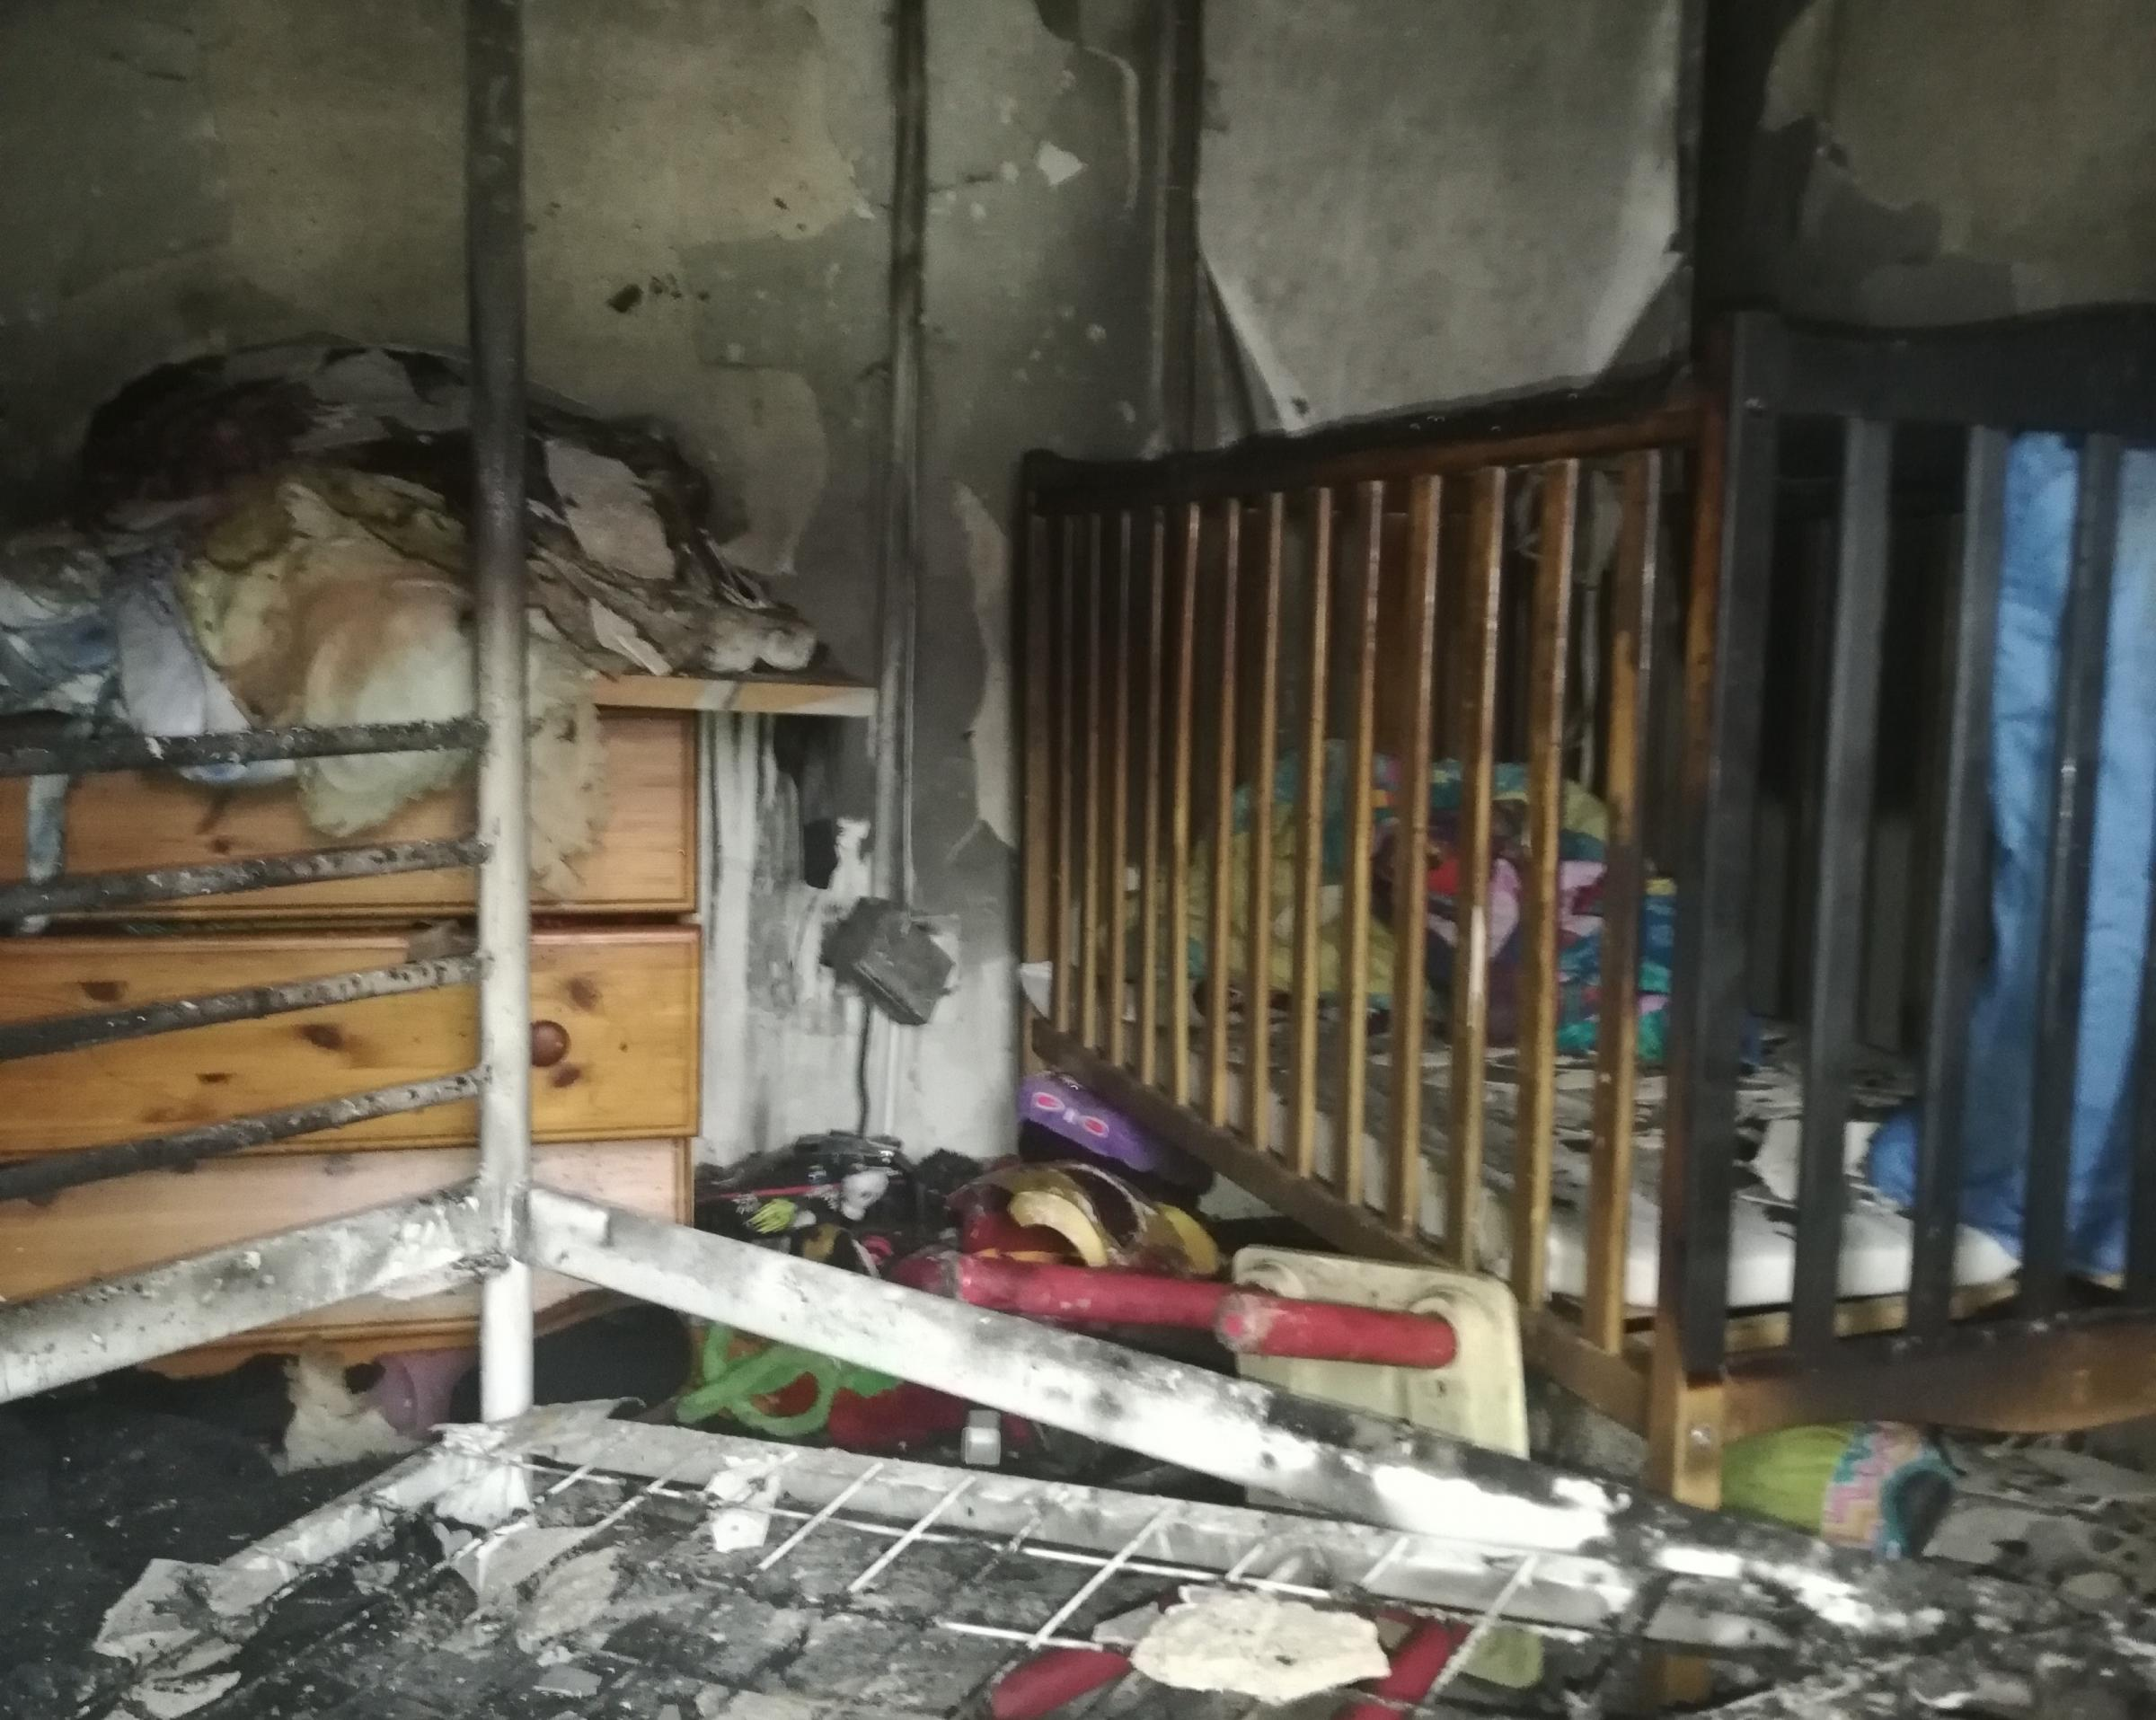 Thornbury family 'devastated' by fire in their home - Gazette Series